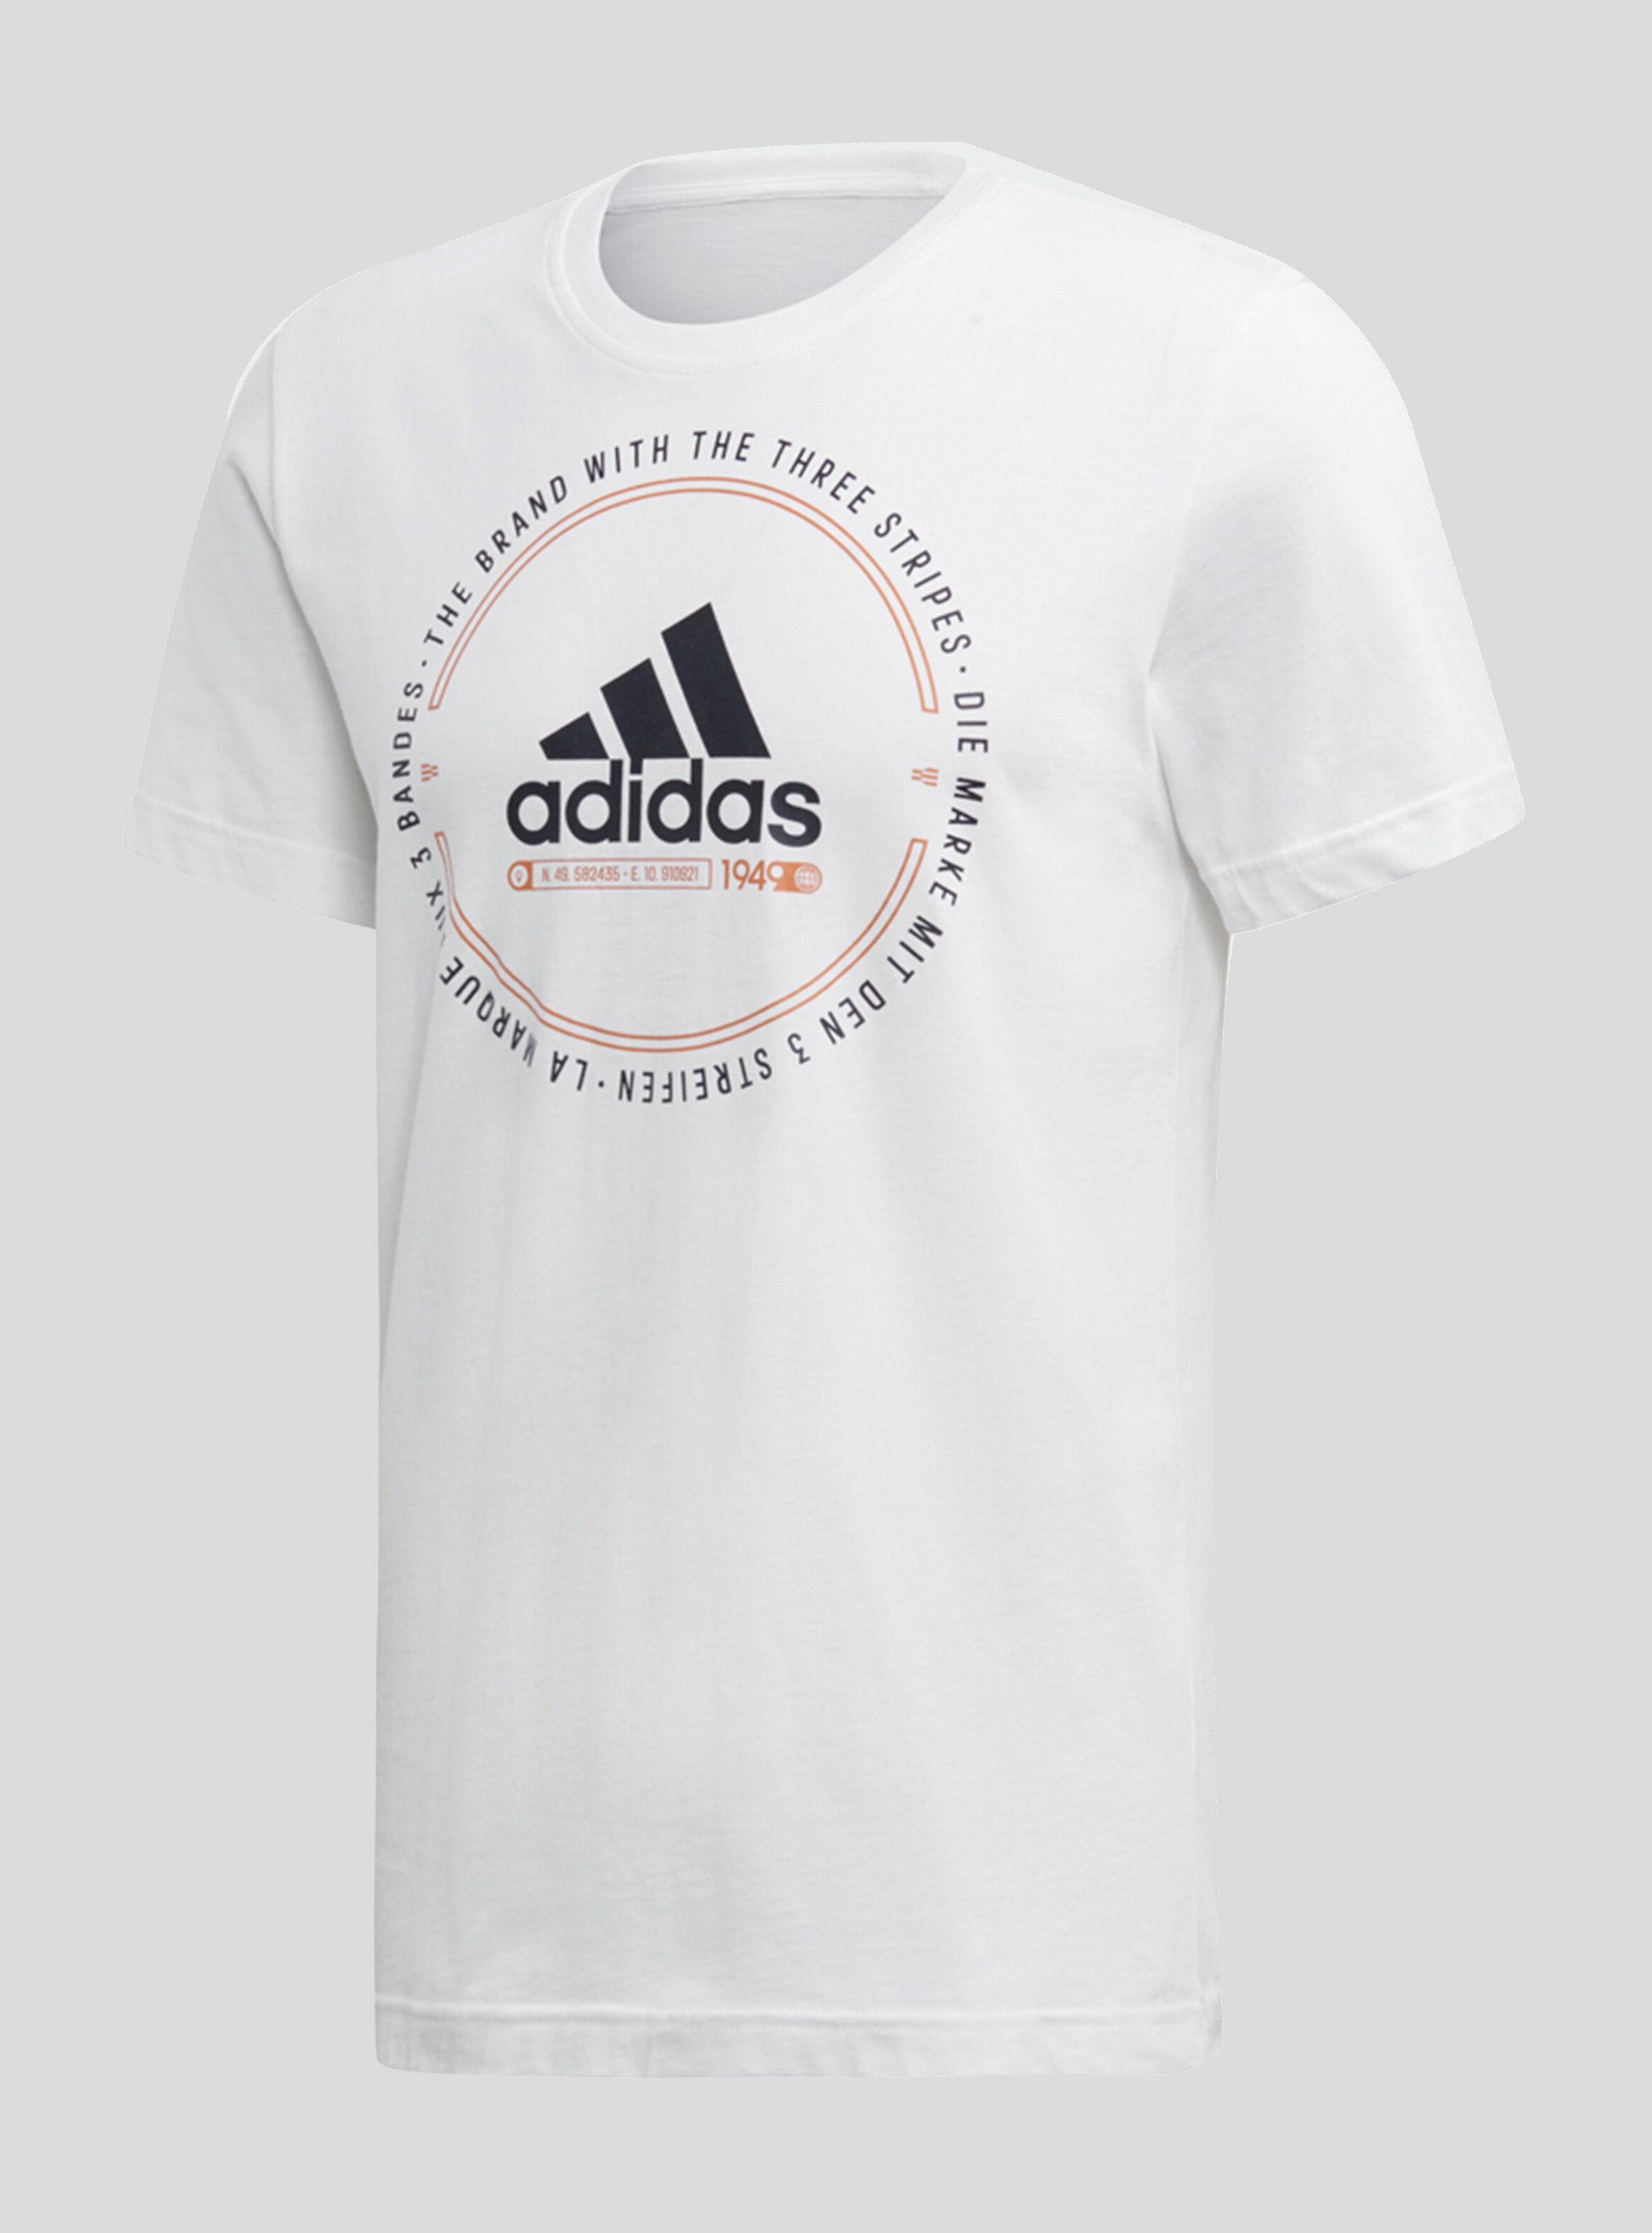 Tee Must Emblem Adidas Polera Hombre Haves Blanco sdxhQrCBt